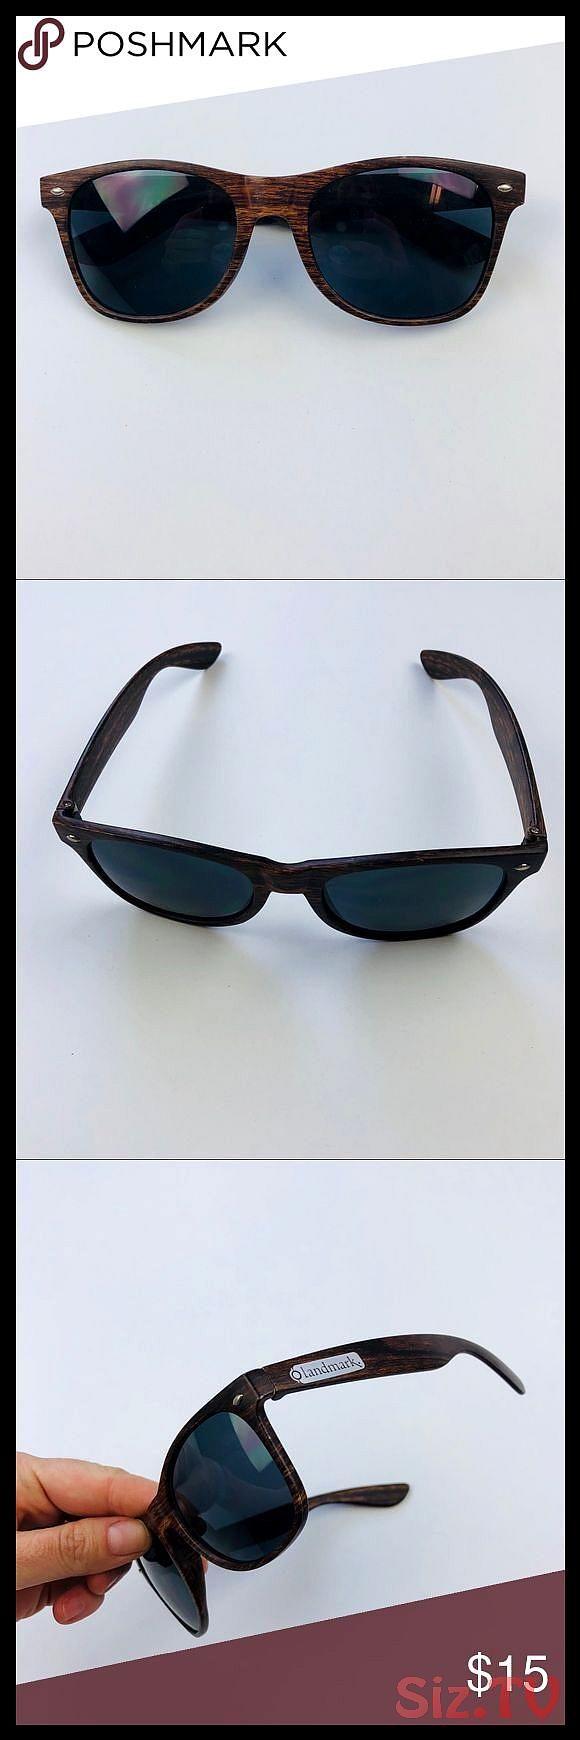 Mens wood grain sunglasses plastic frame Mens square wood grain sunglasses brown outdoor plastic like new Accessories Sunglasses Mens wood grain sunglasses plastic frame...